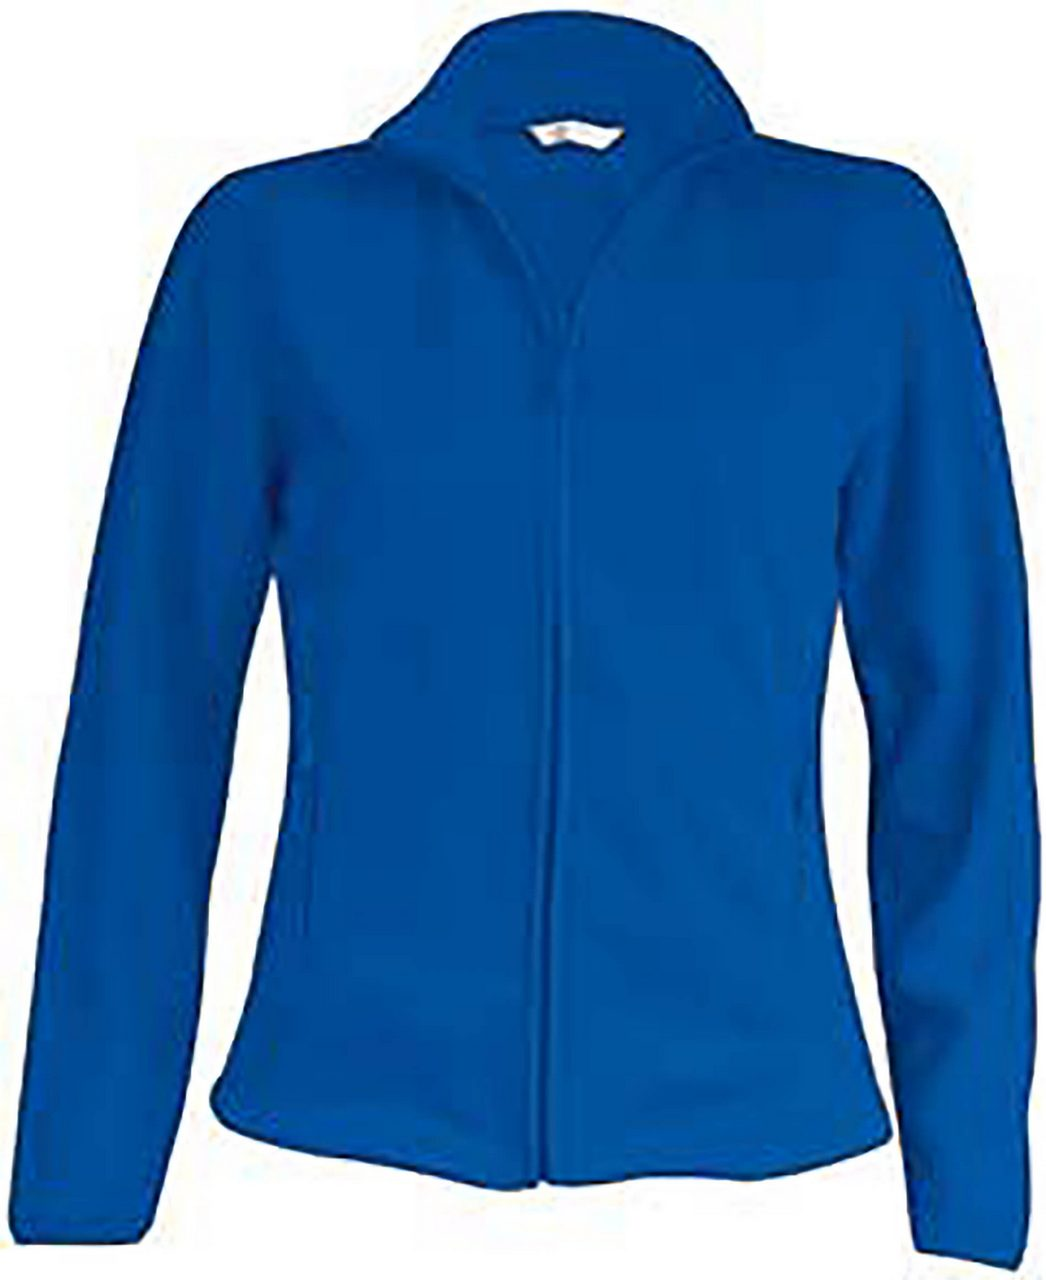 Fleece KA907 albastru royal Veste jachete dama barbatesti polar fleece softshell fas gluga ploaie vant broderie serigrafie termotransfer   Toroadv.ro